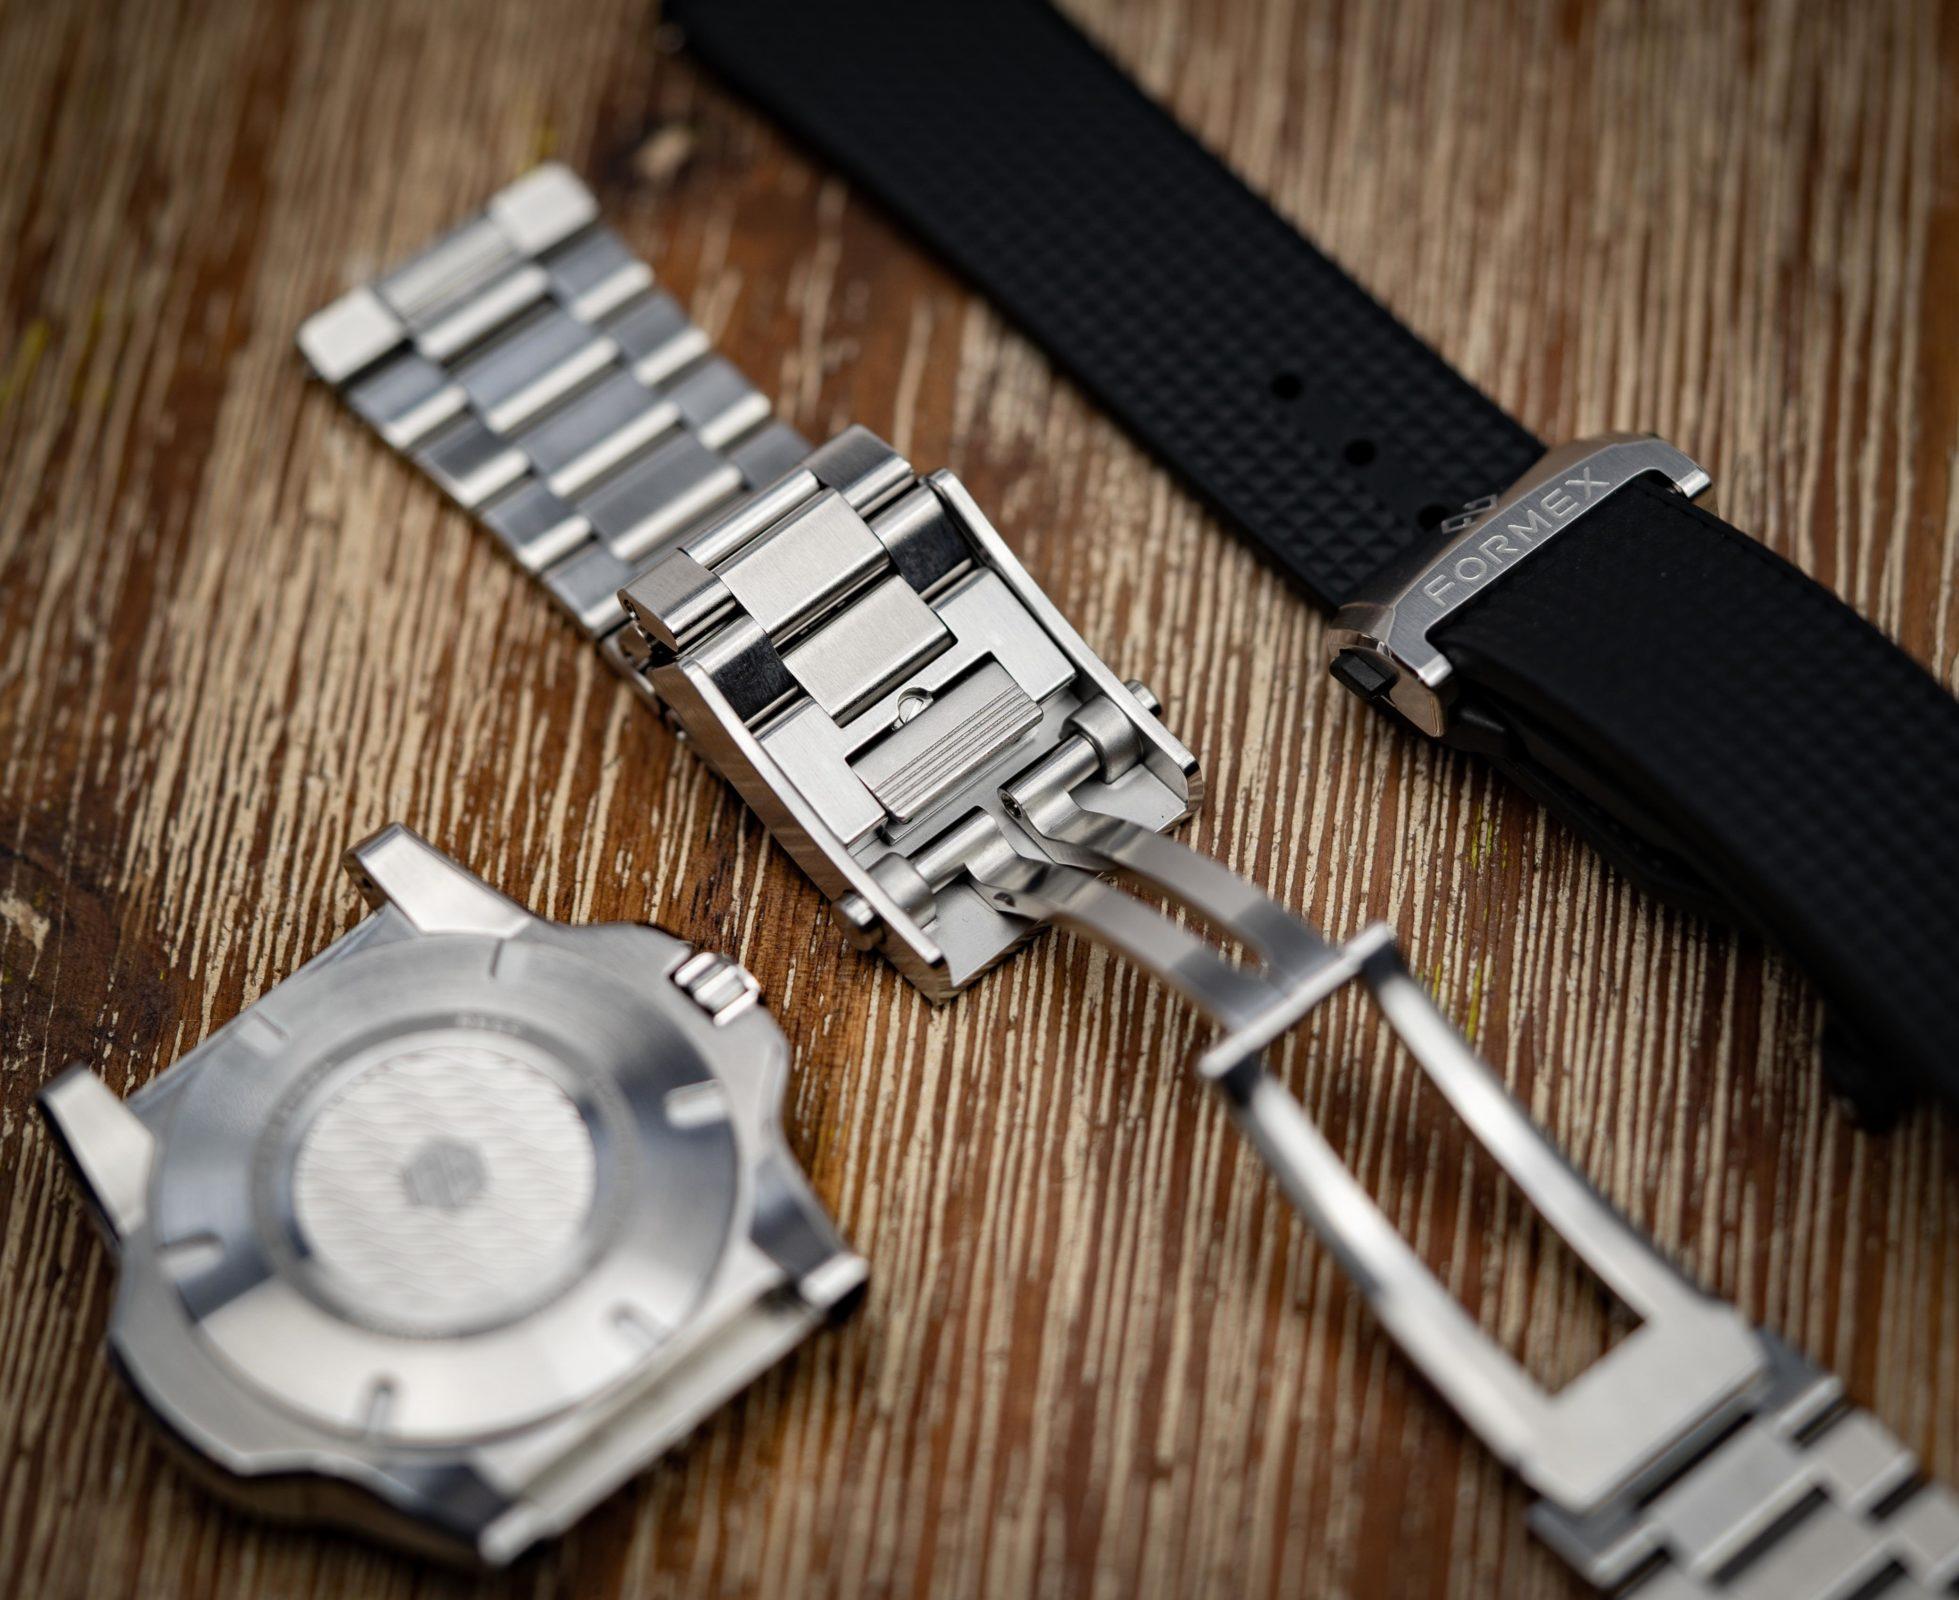 Formex-Reef-Automatik-Chronometer-300m-22